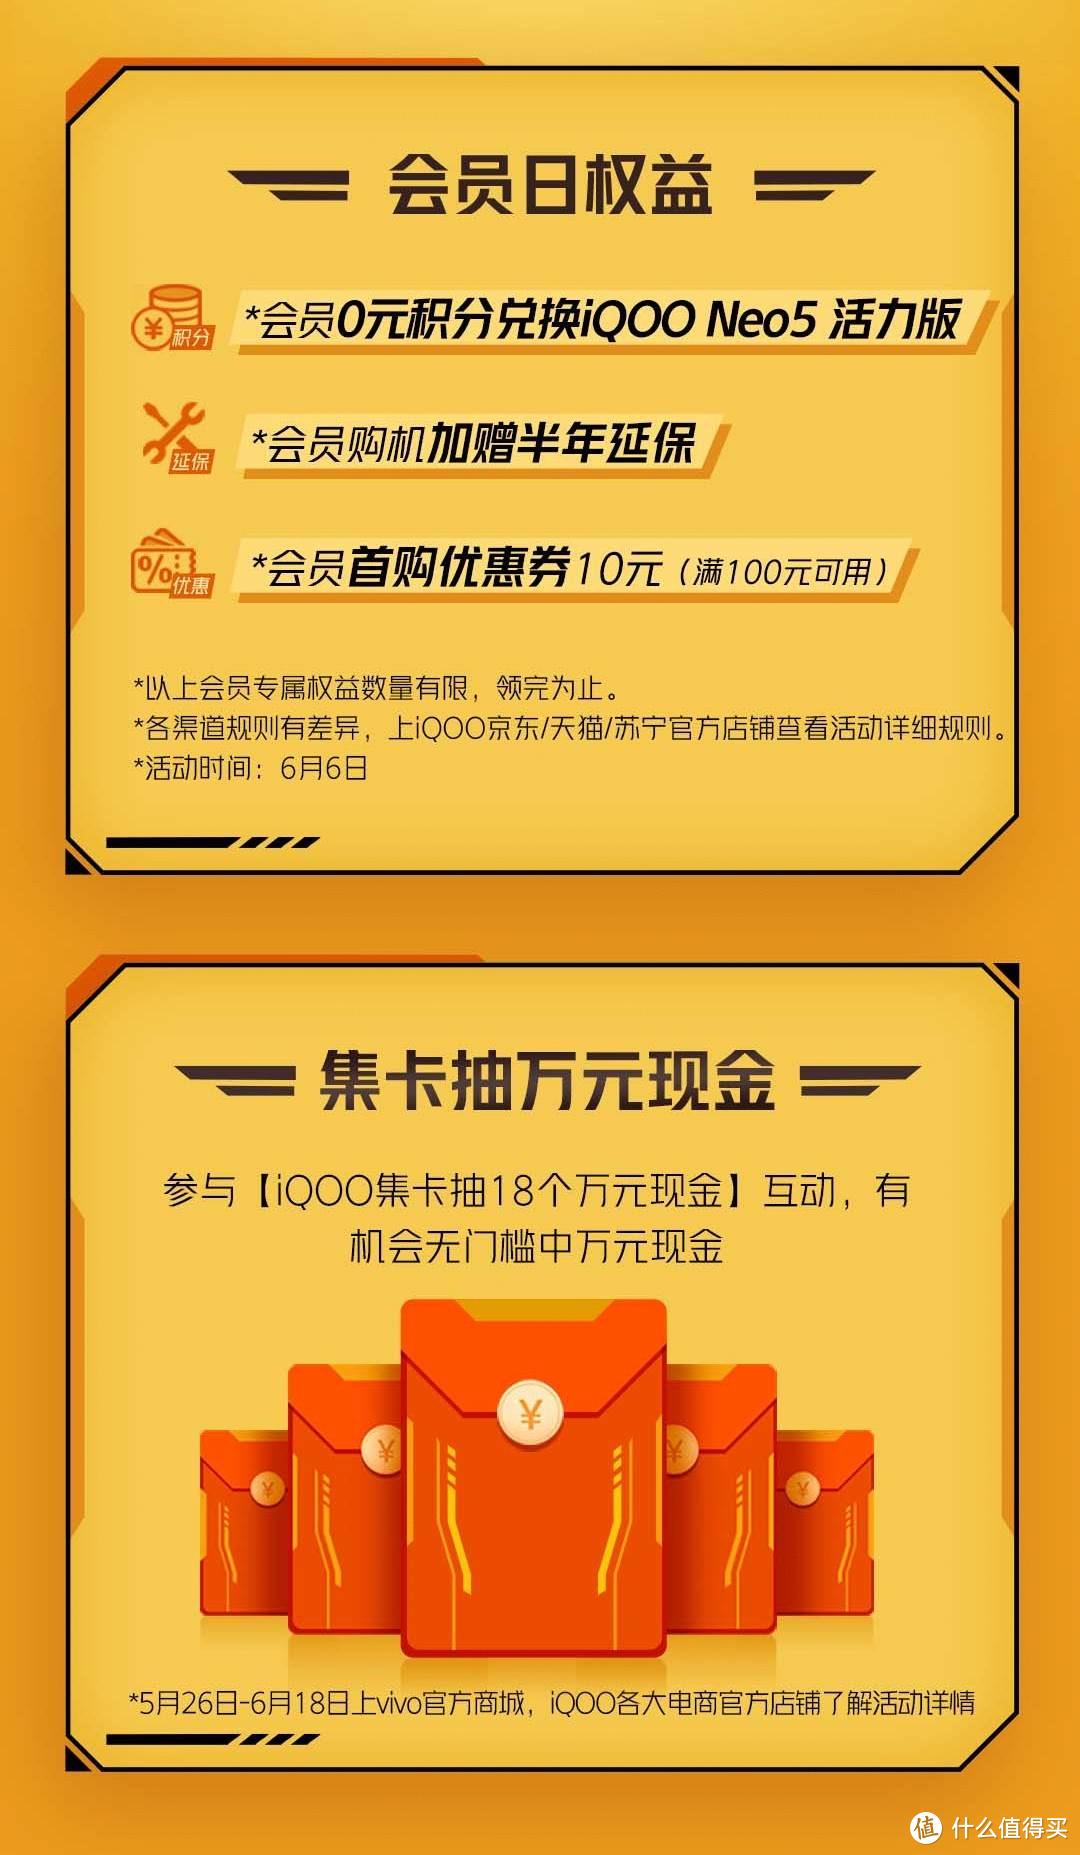 iQOO会员日来袭!购机优惠超乎想象,还有万元现金抽奖送